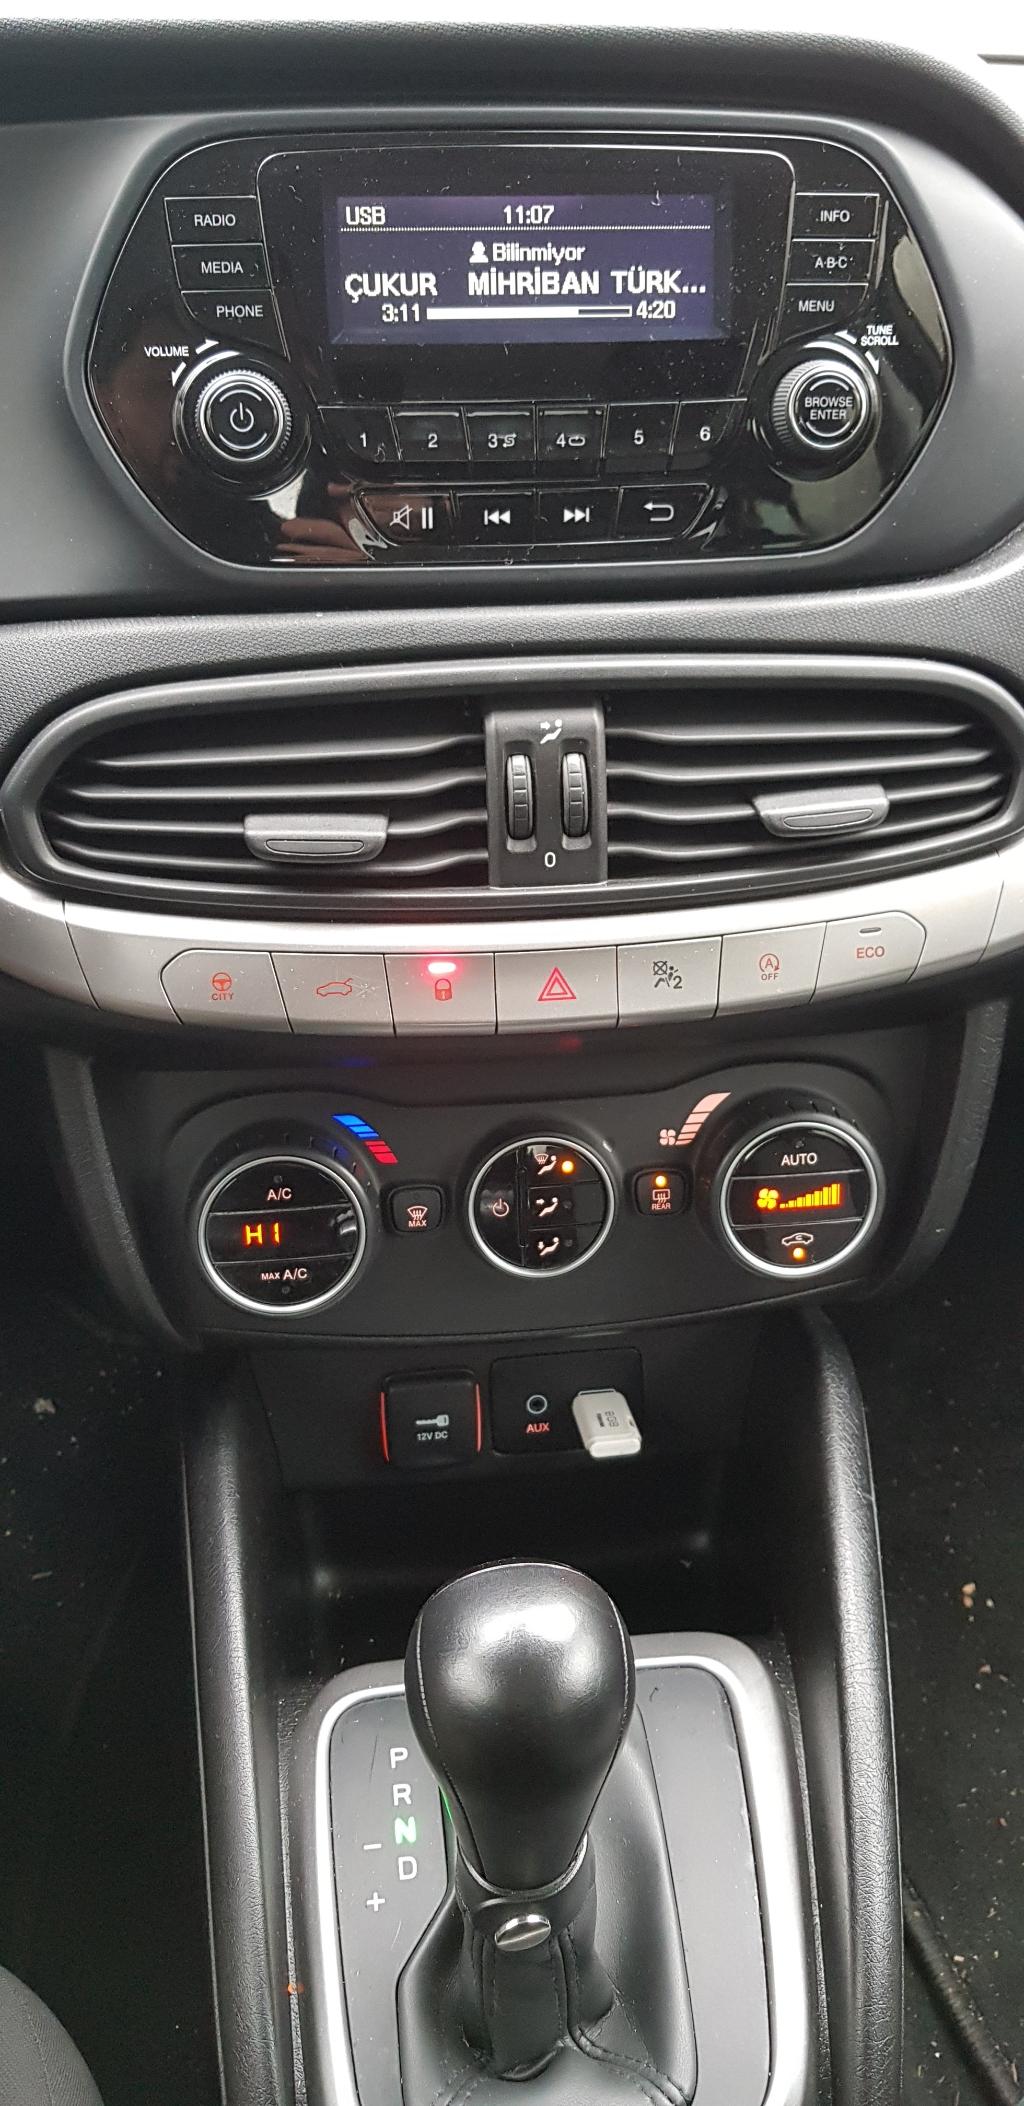 FIAT Egea 2016 Model Dizel Otomatik